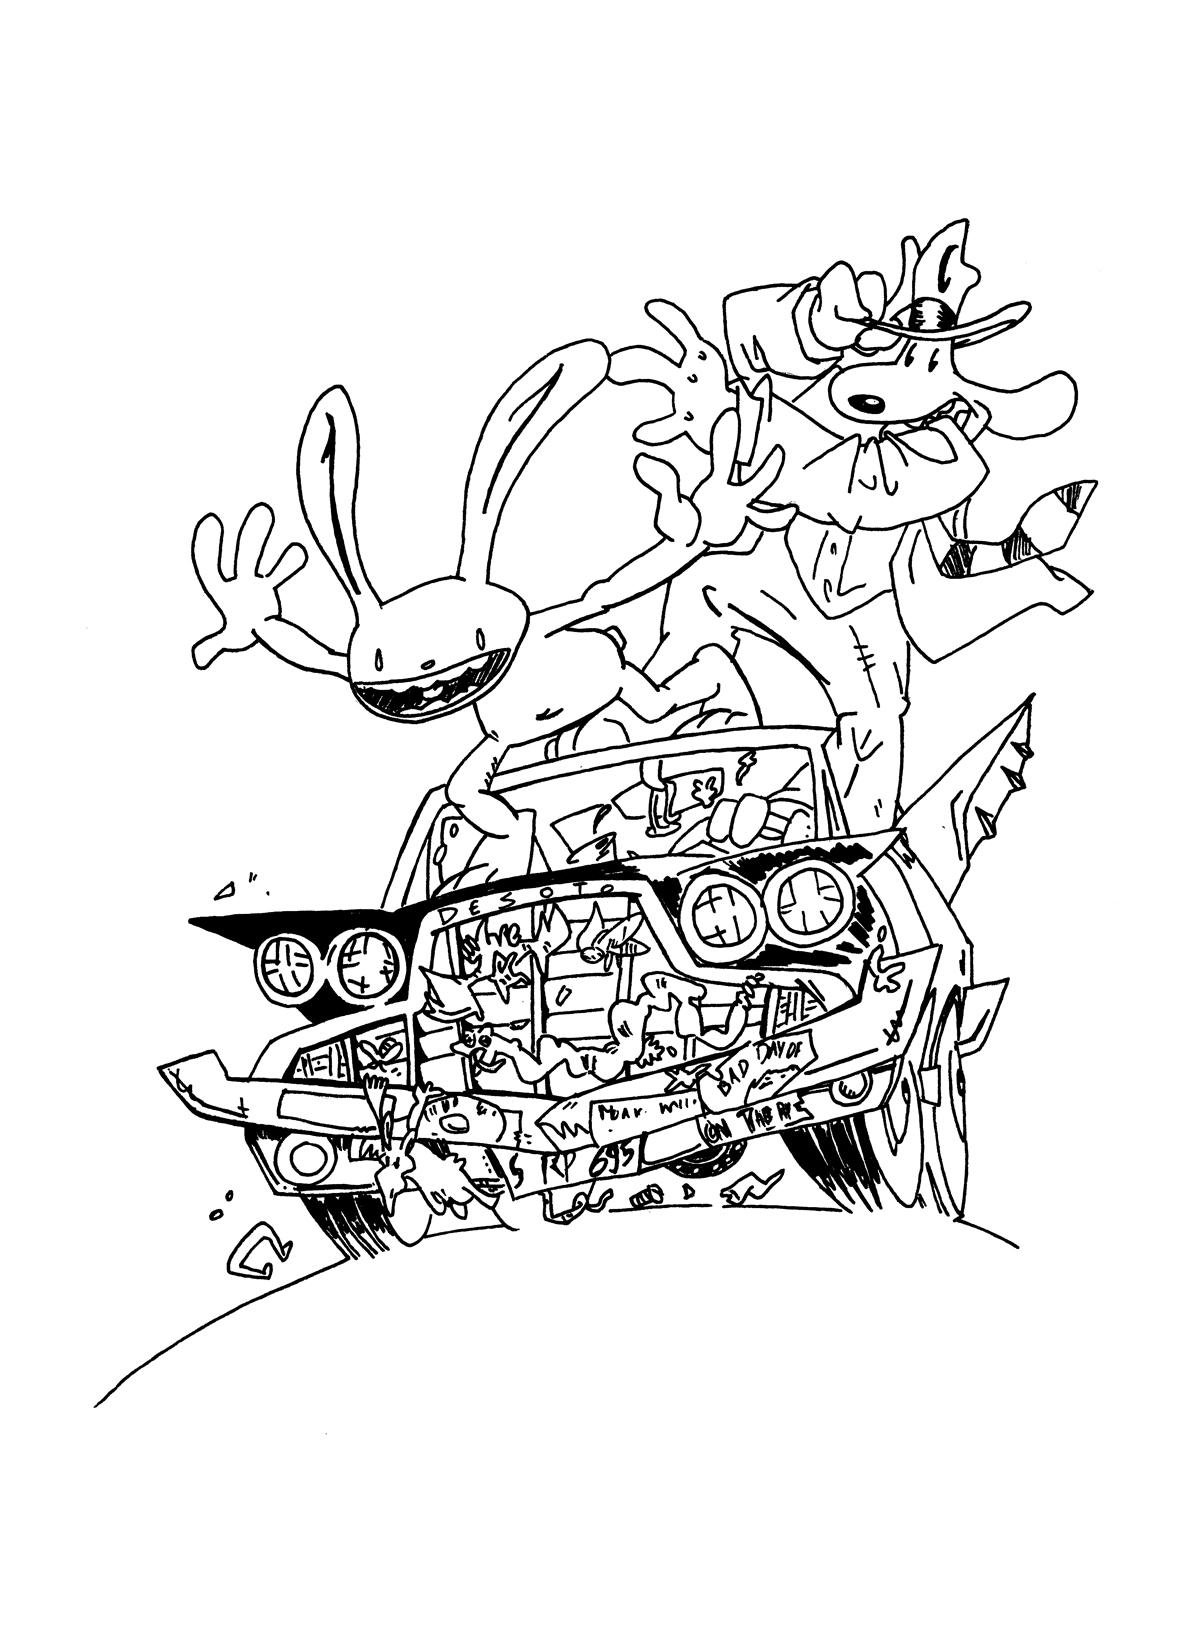 Fan-art de Sam & Max par Steve Purcell